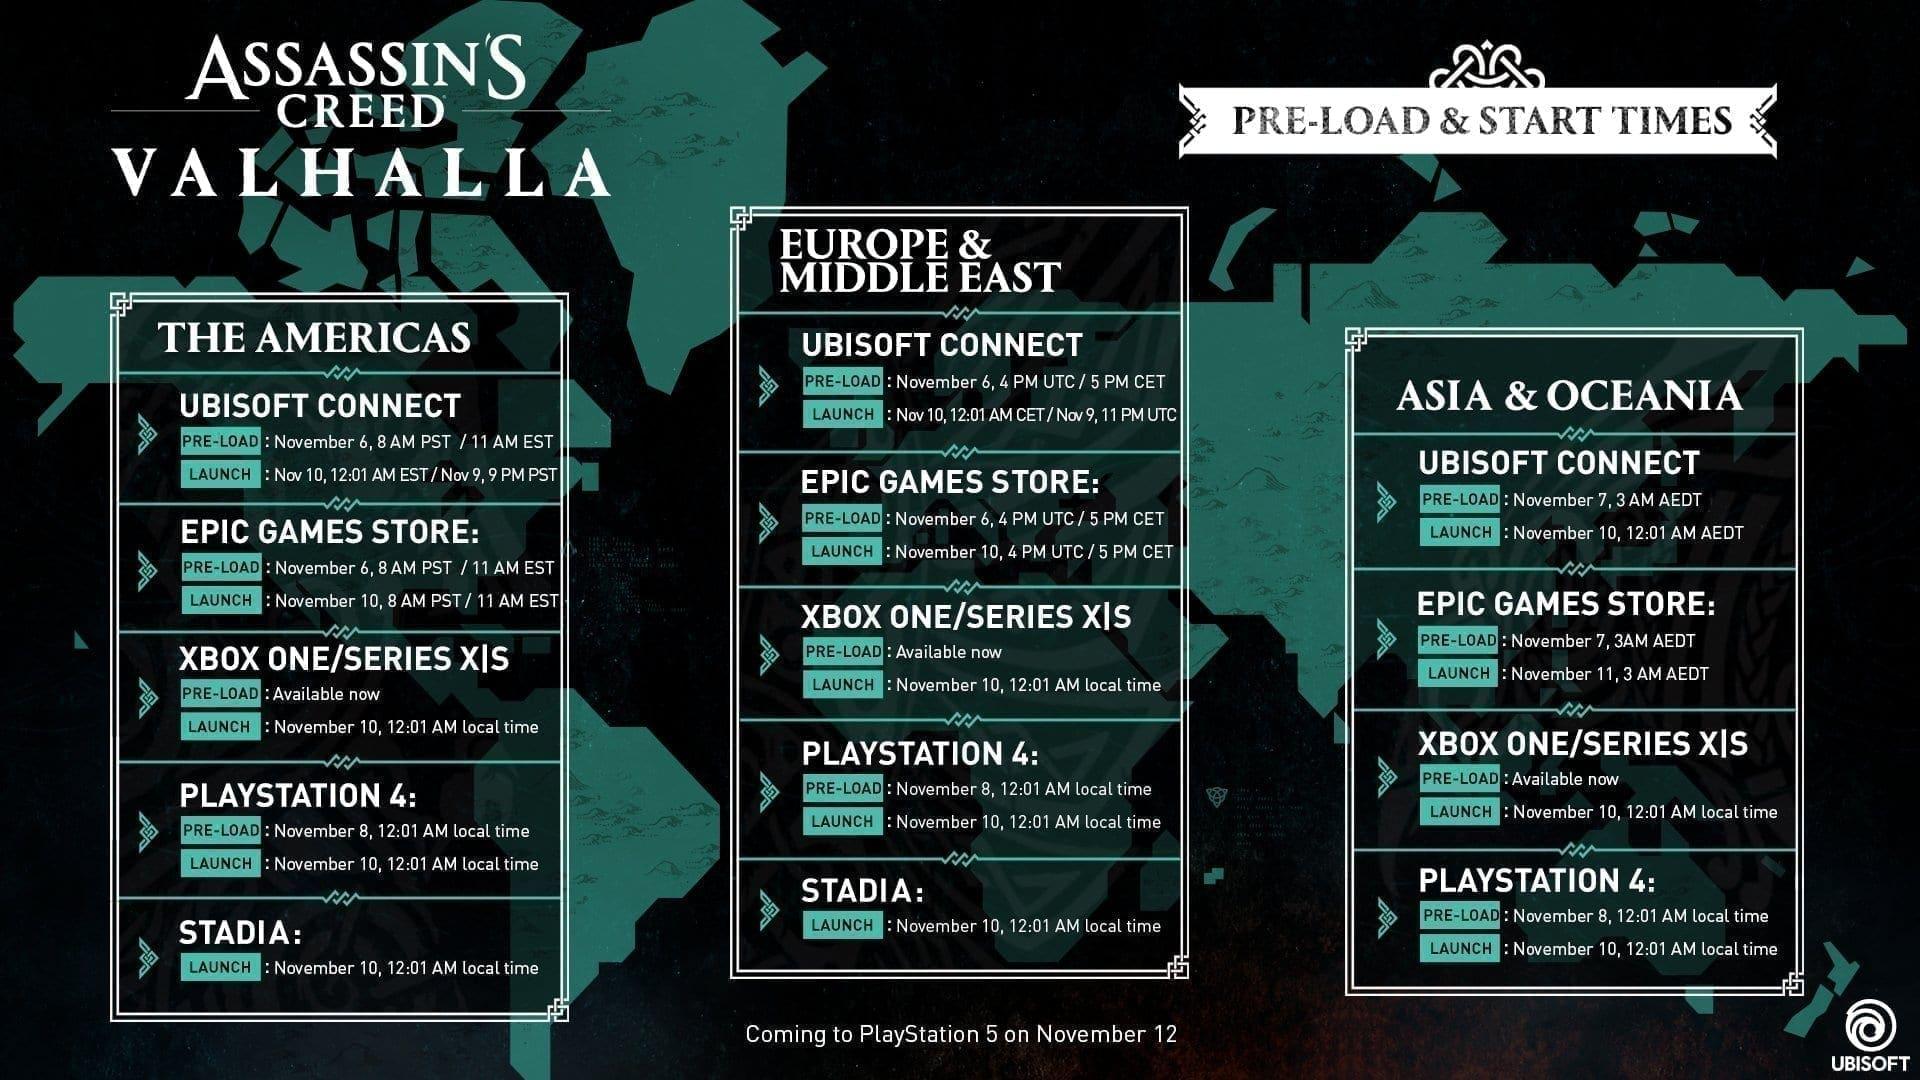 Assassin's Creed Valhalla Pre-Load Launch